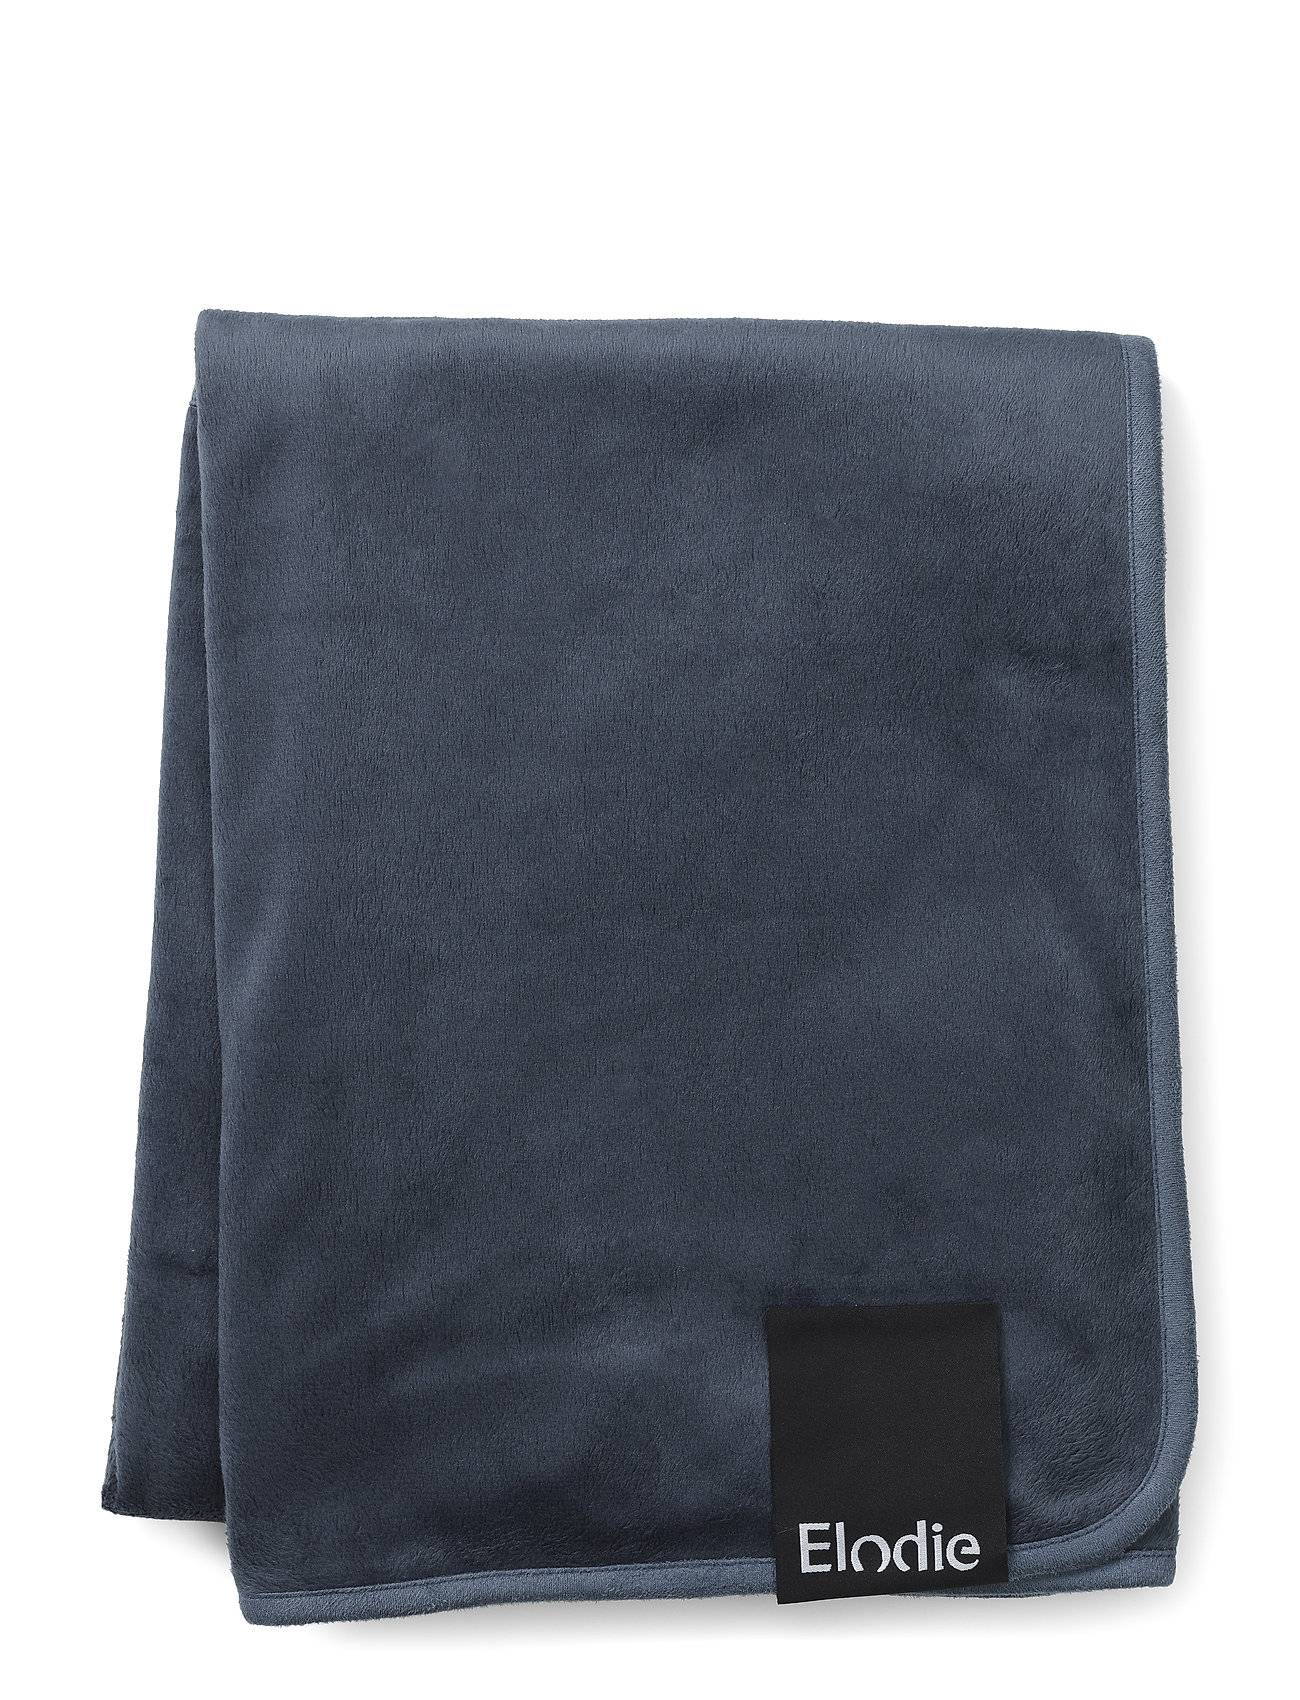 Elodie Details Pearl Velvet Blanket - Juniper Blue Home Sleep Time Blankets & Quilts Sininen Elodie Details